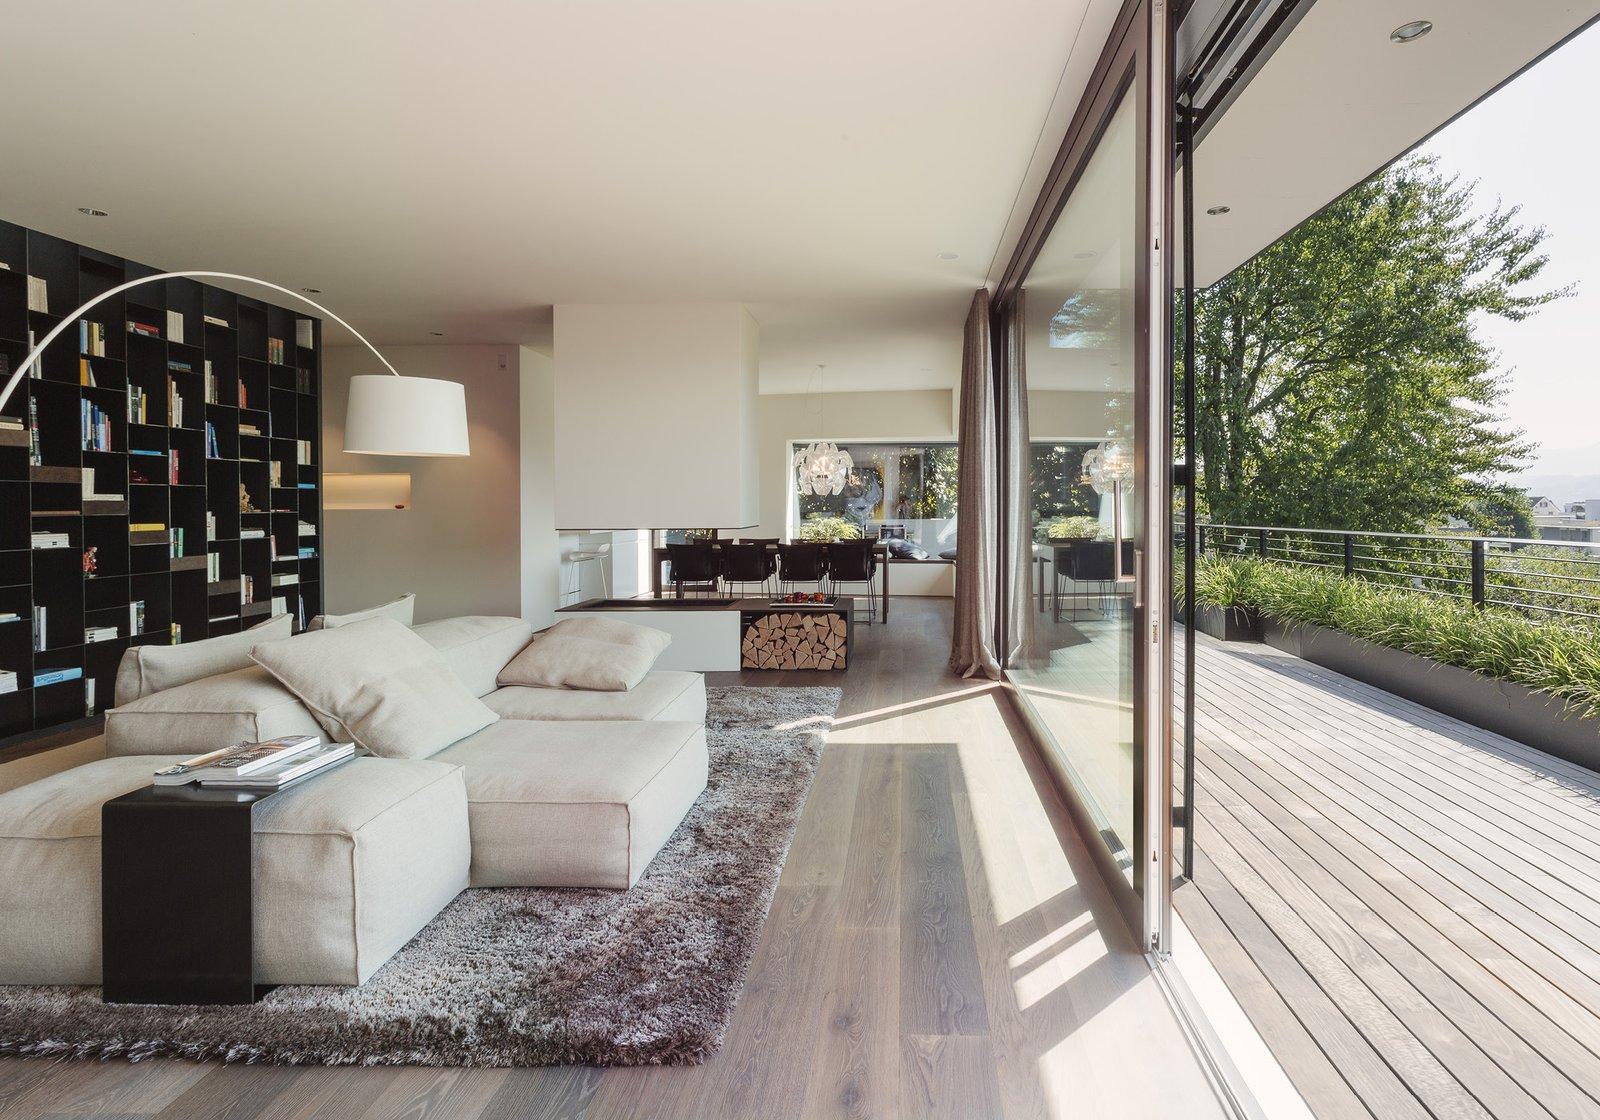 Living Room, Sectional, Floor Lighting, Medium Hardwood Floor, and Rug Floor  Object 336 - beautiful blackbox by meier architekten zurich